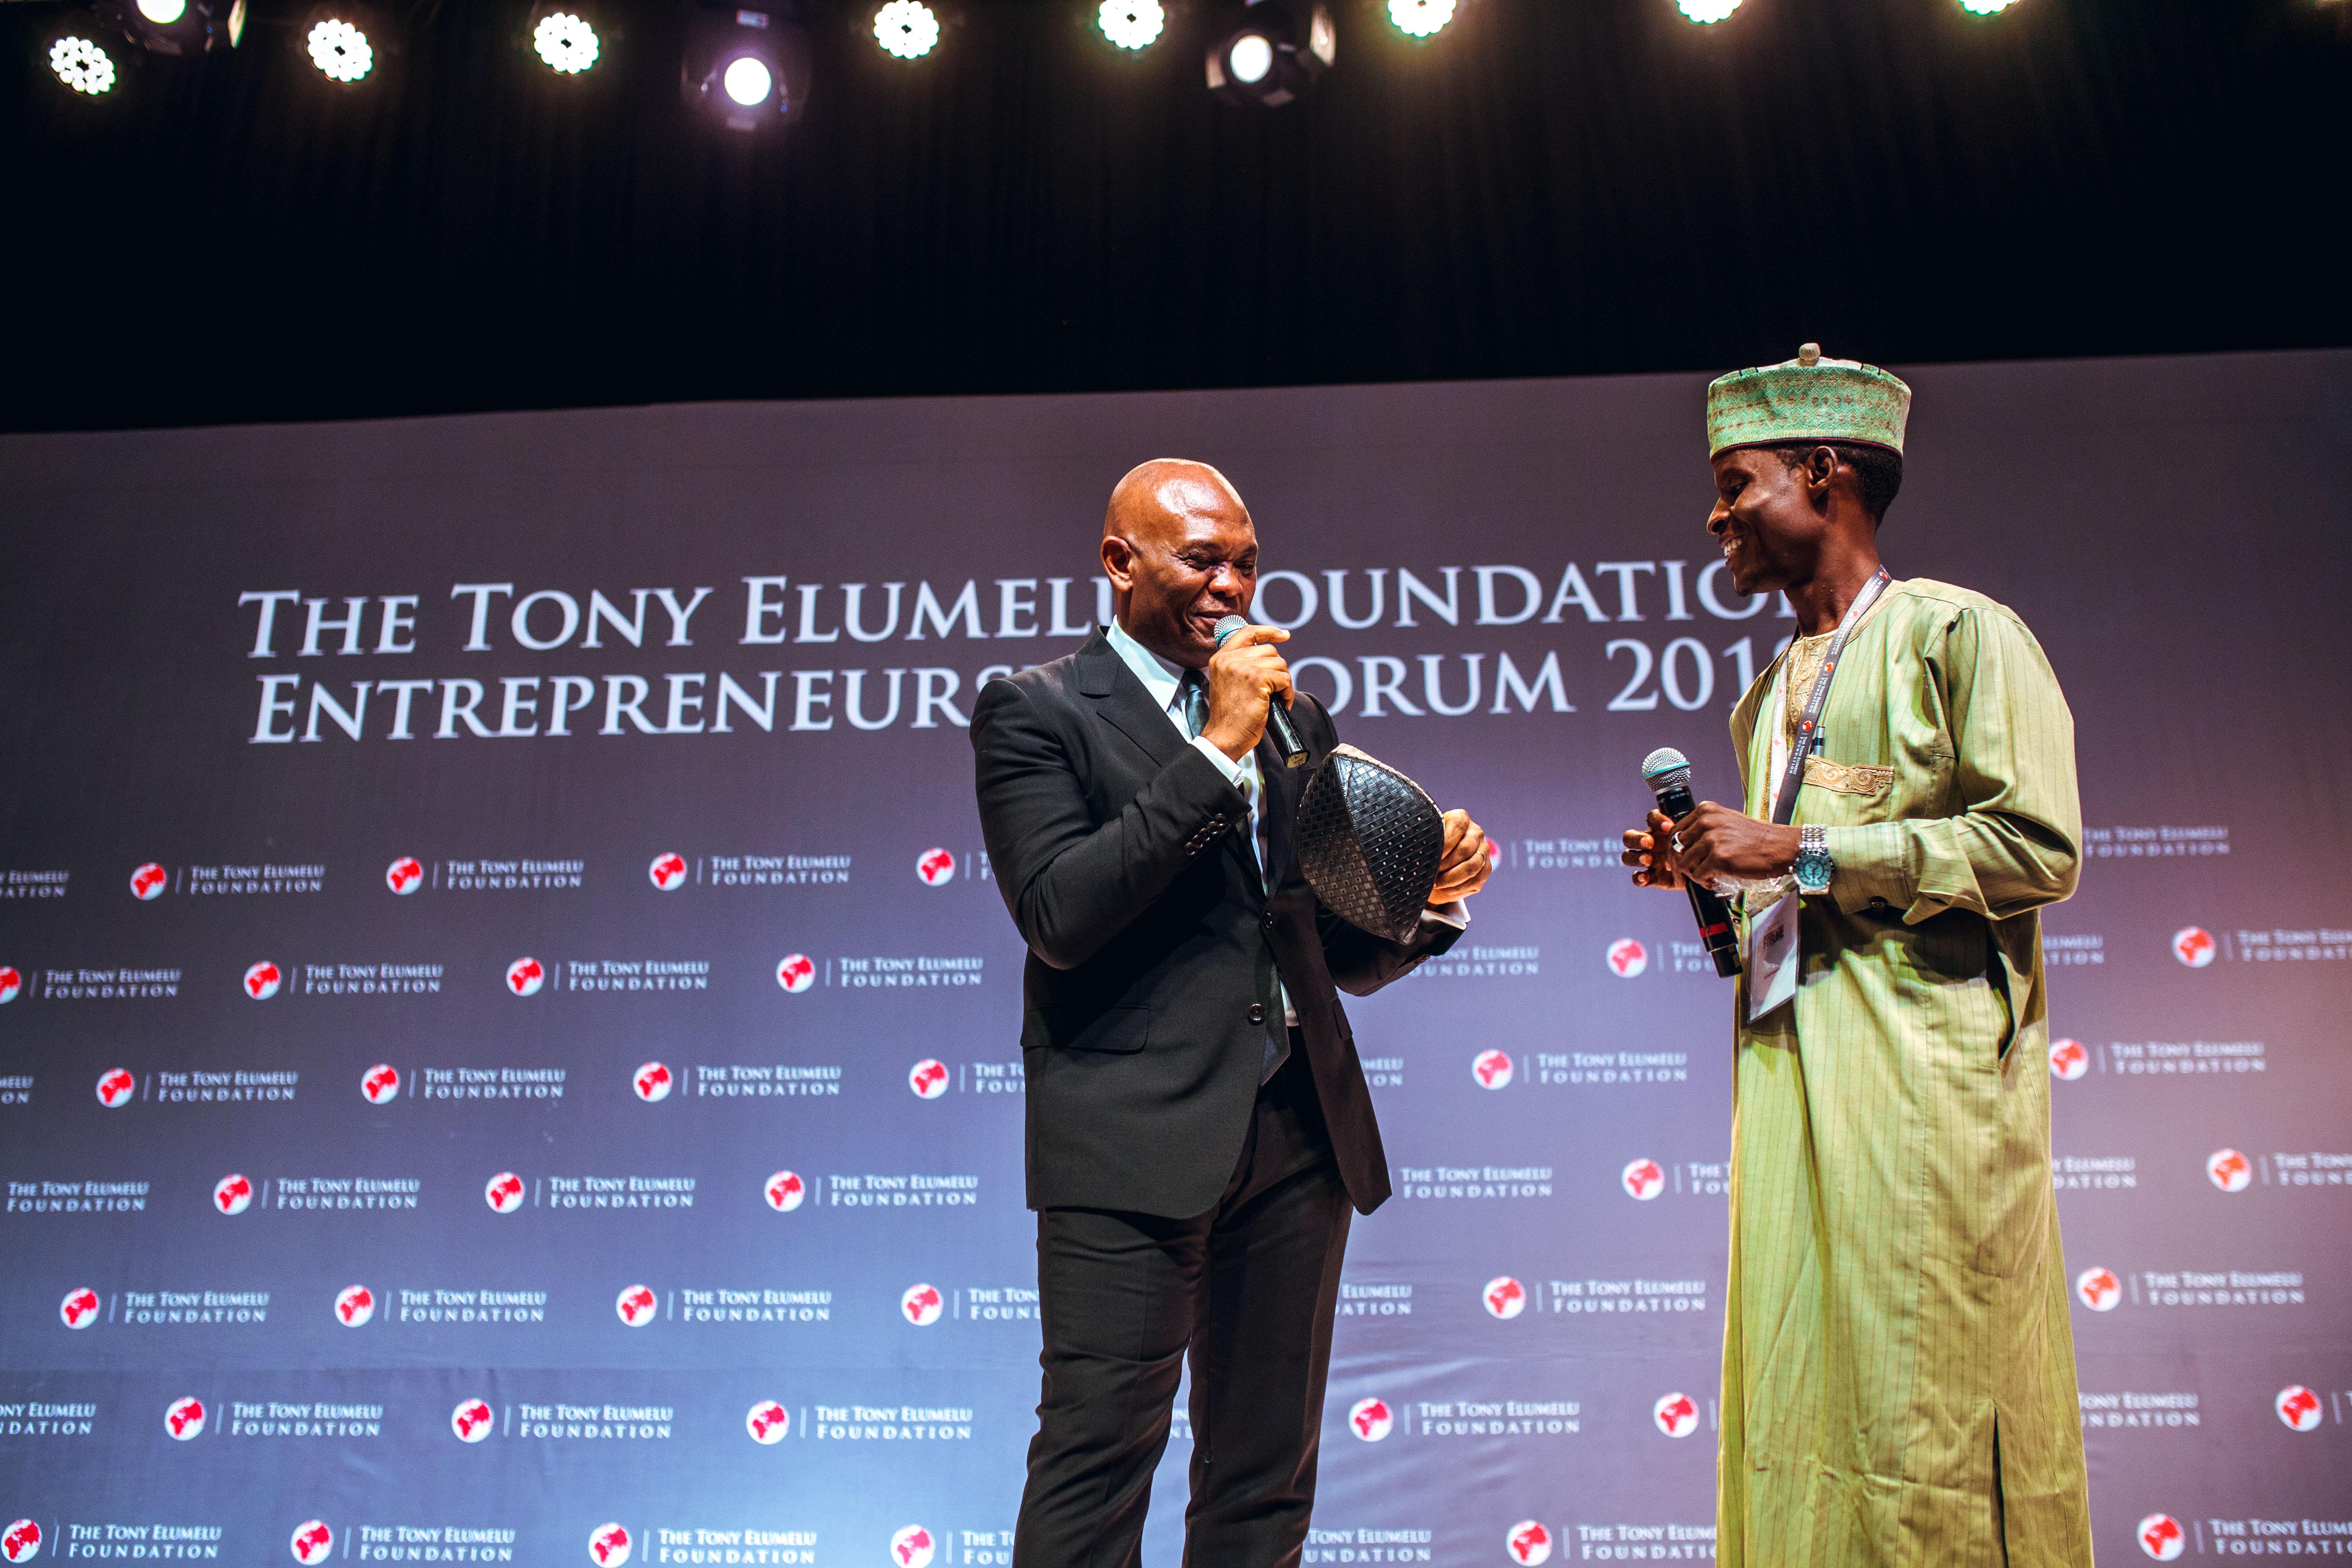 Highlights from the Tony Elumelu Foundation Entrepreneurship Forum